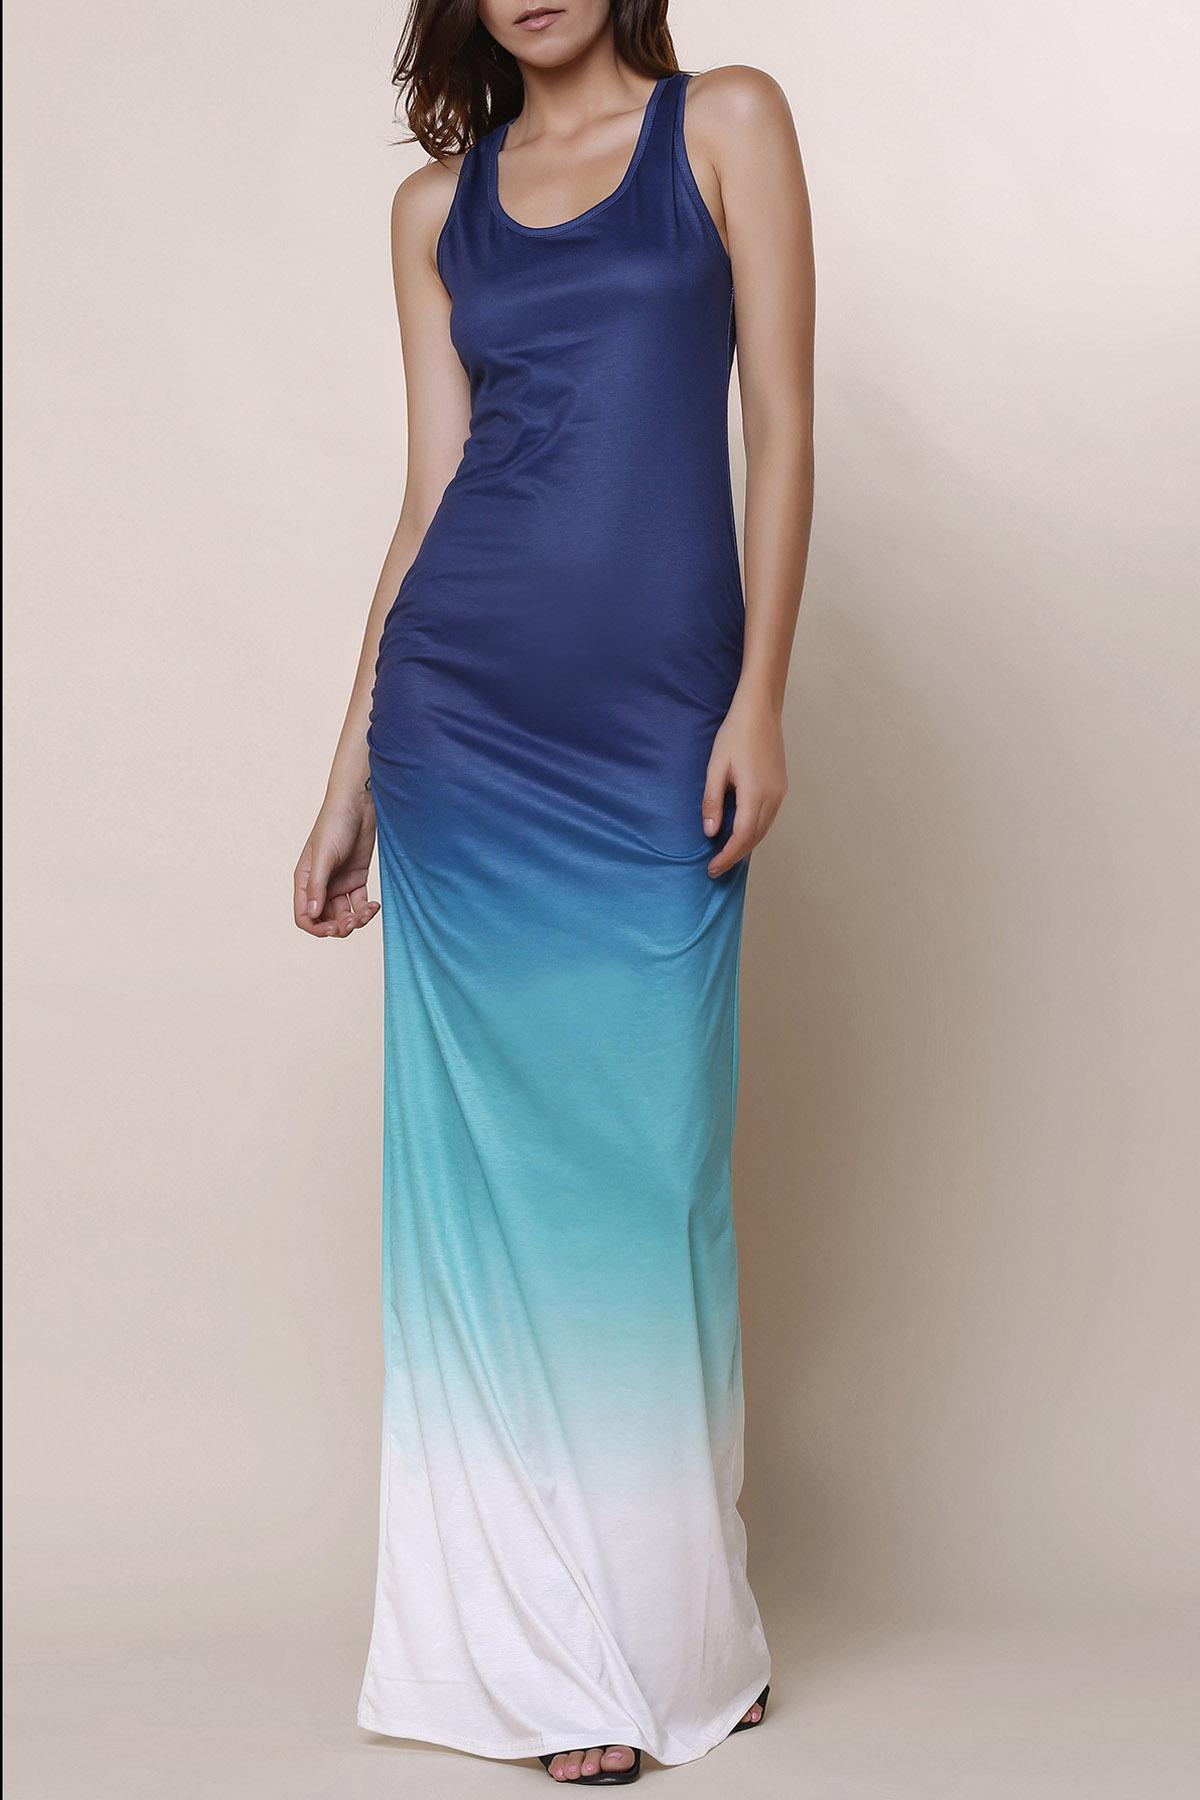 Ombre Color Scoop Neck Maxi Sundress - BLUE S